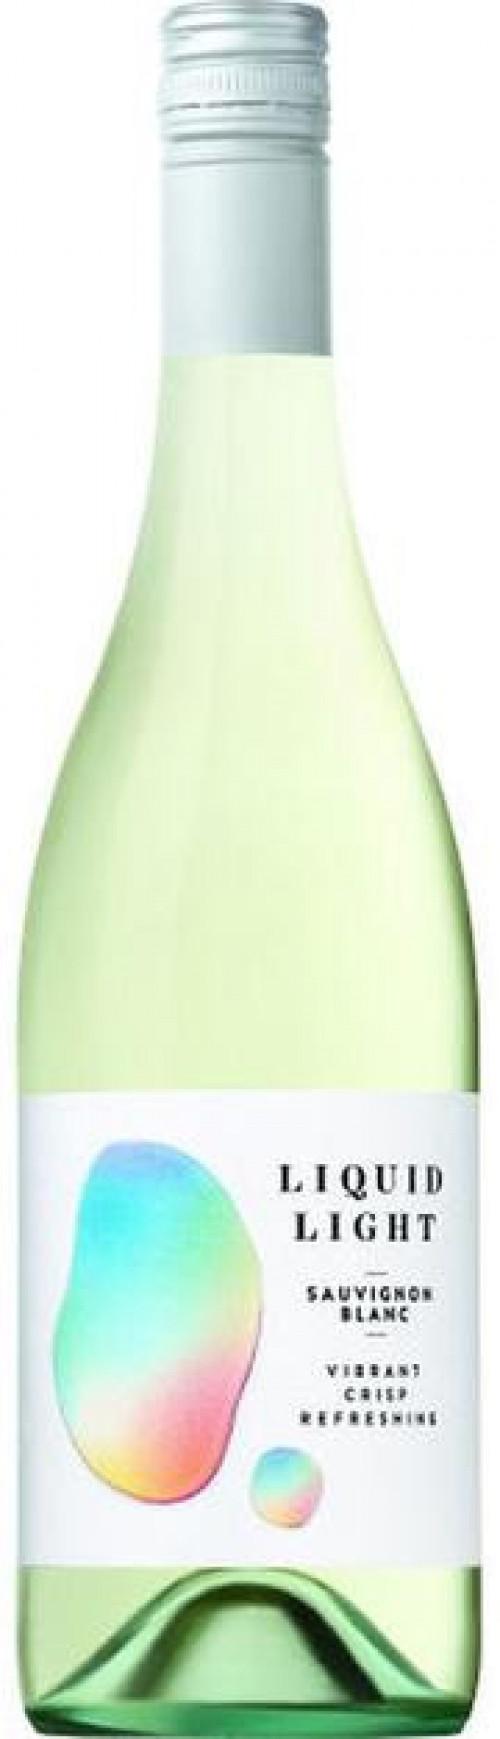 Liquid Light Sauvignon Blanc 750ml